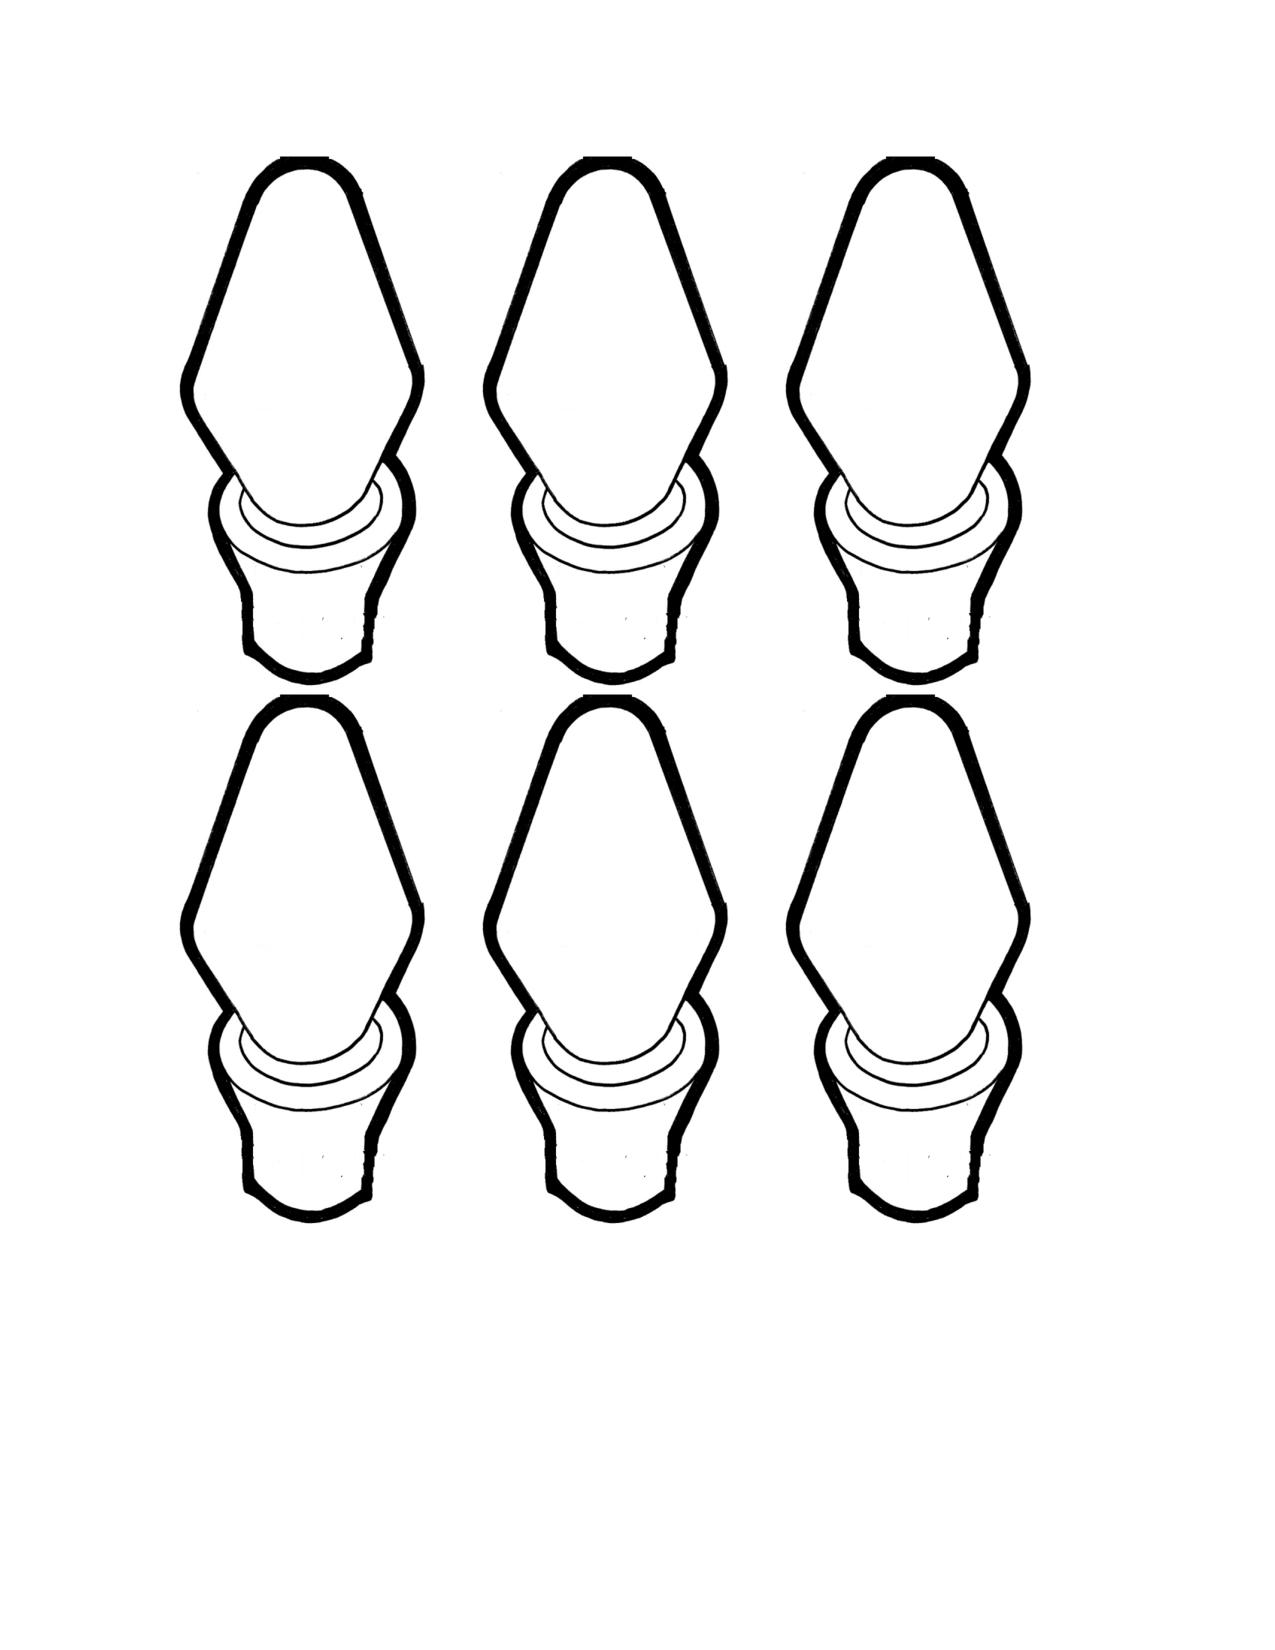 Bulb clipart here Bulb template craft templates bulb